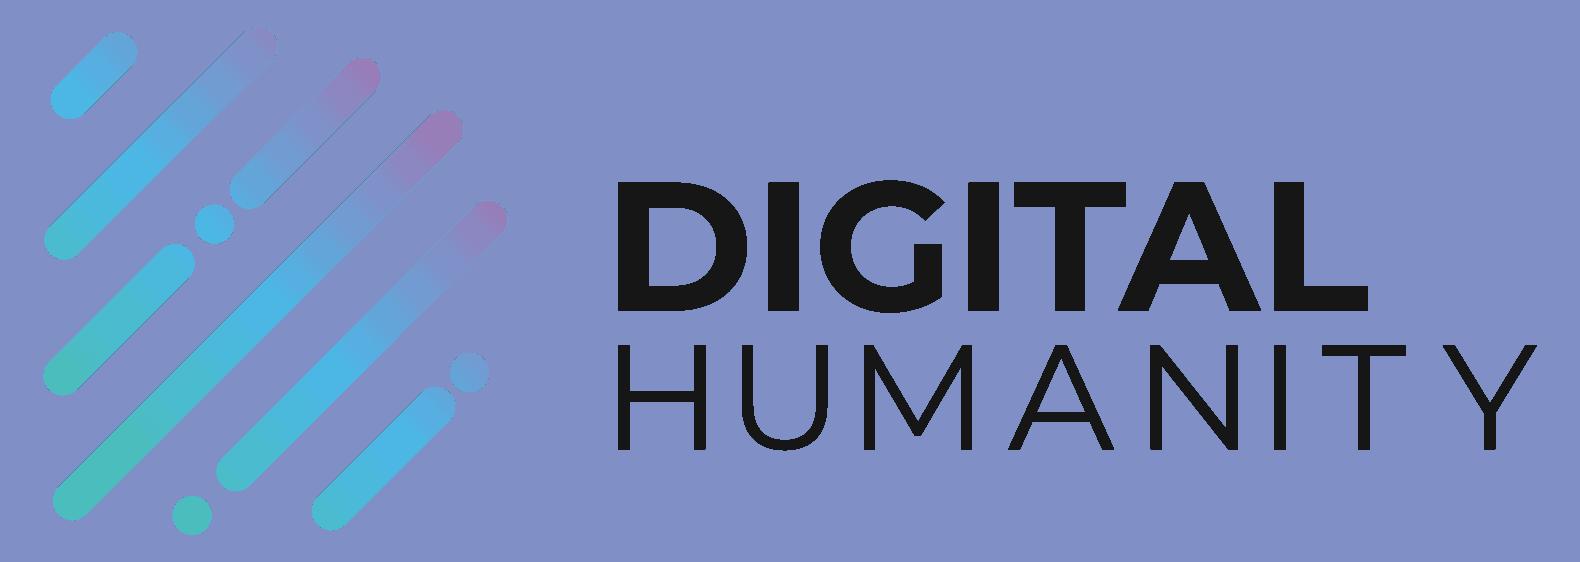 Digital Humanity